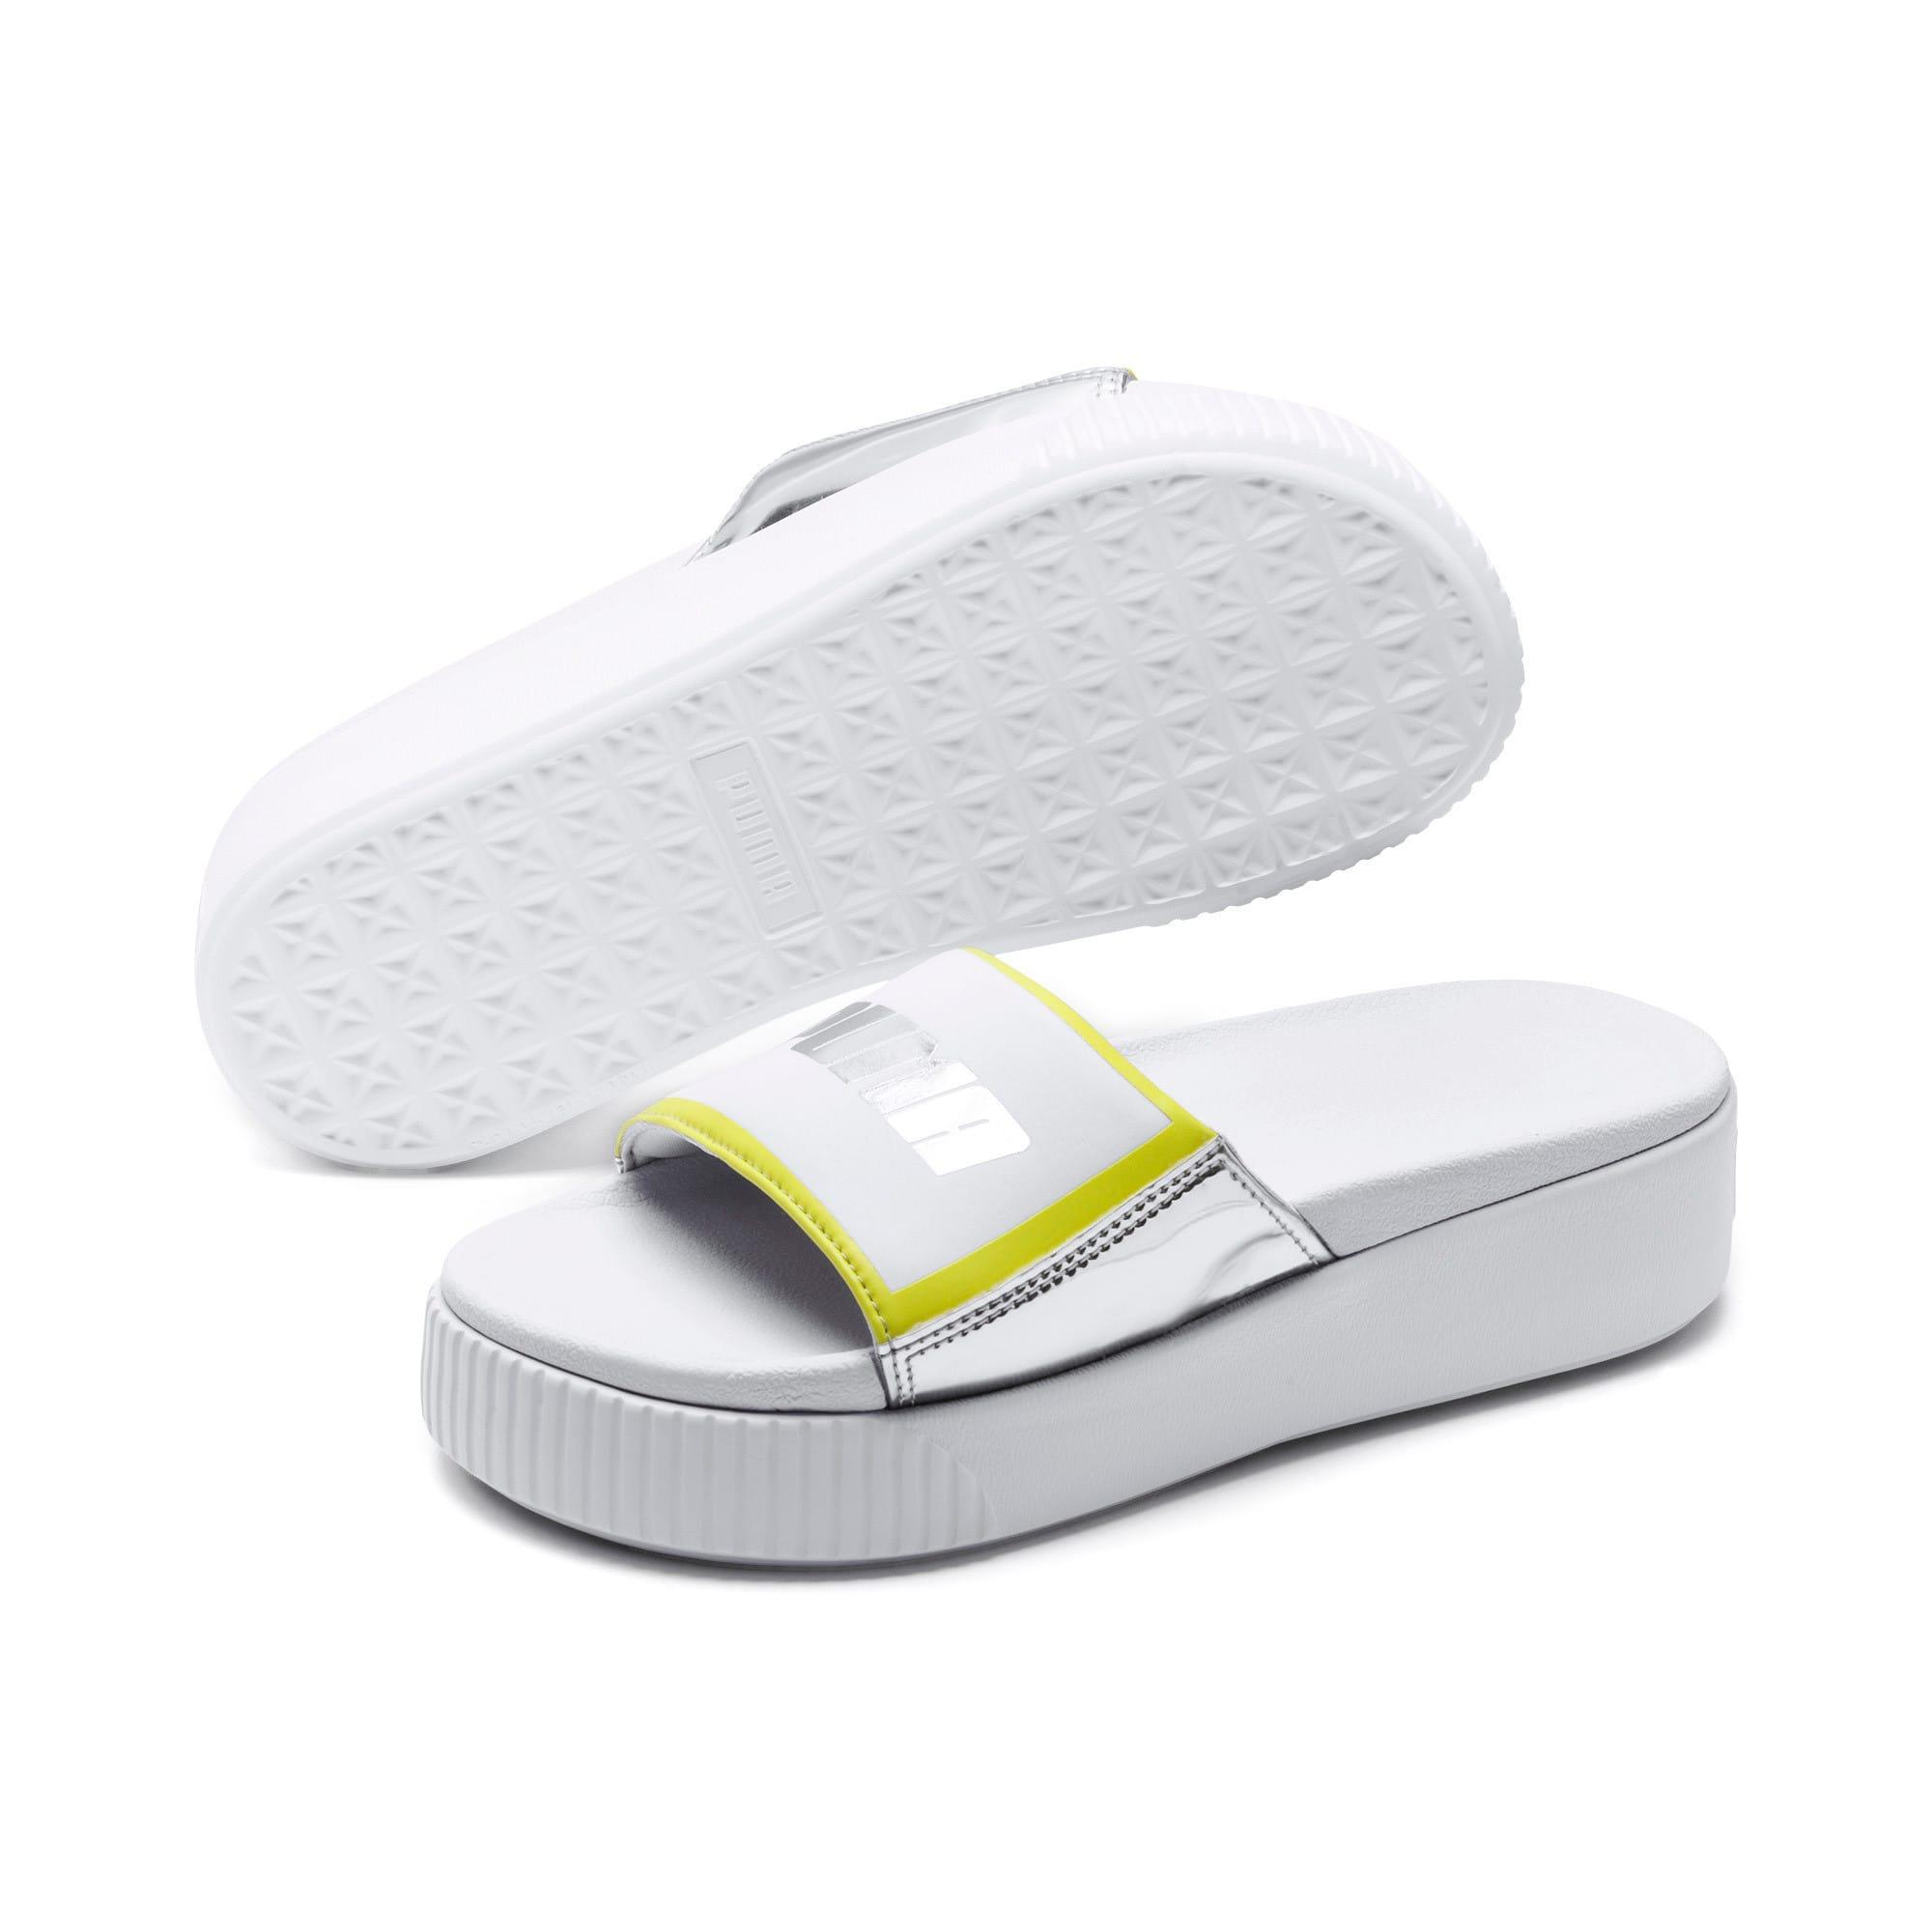 Thumbnail 2 of Platform Slide Trailblazer Metallic Women's Sandals, Puma White-Puma Silver, medium